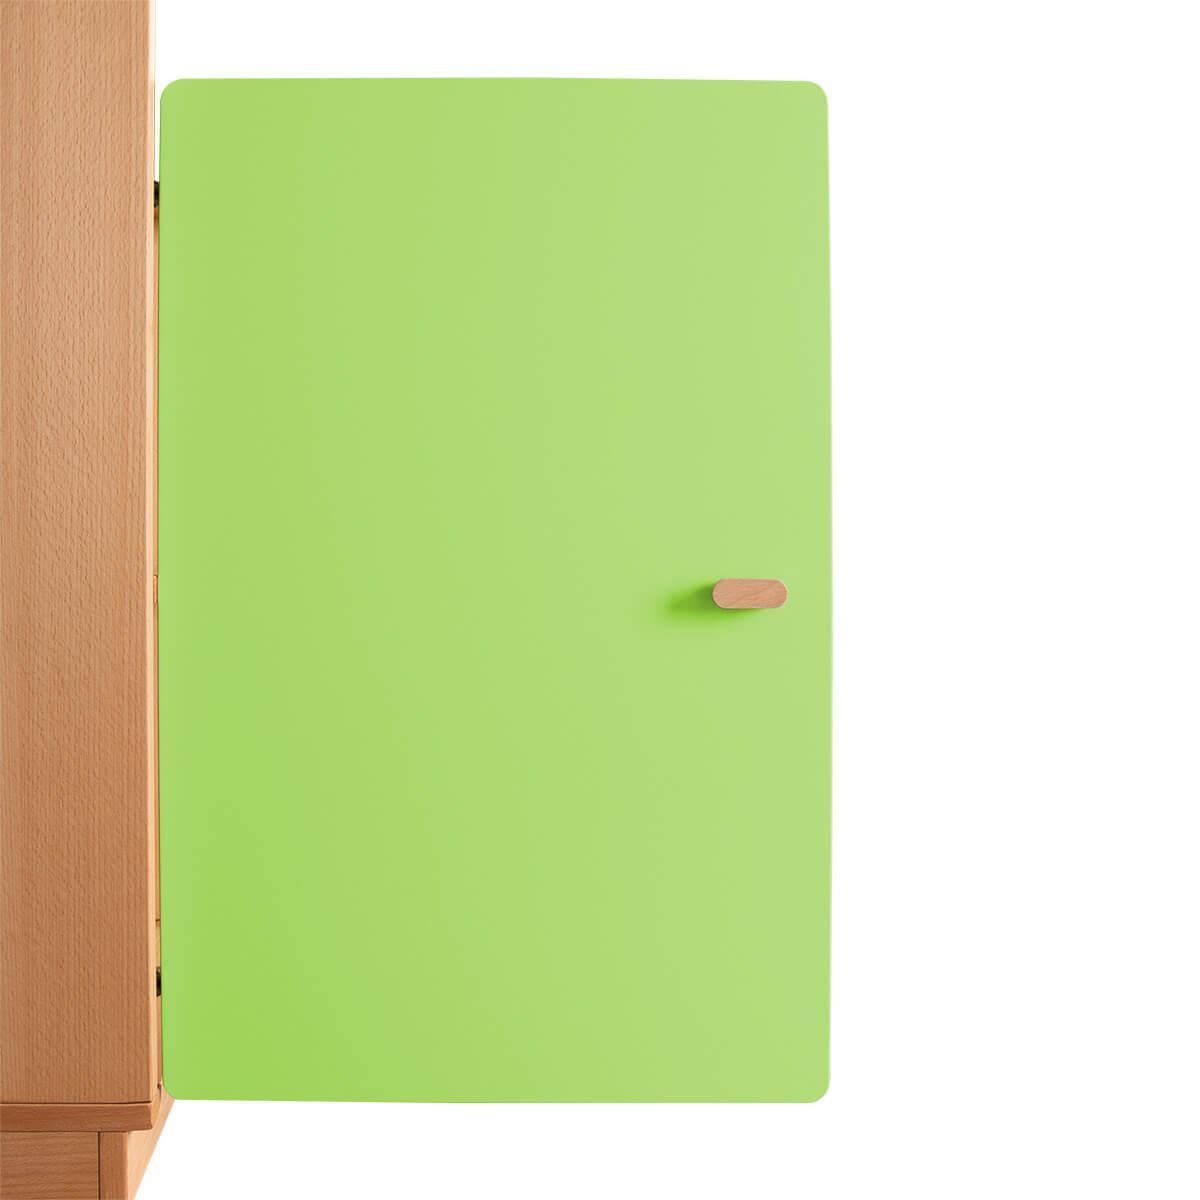 Schranktür 2/5 70cm-Griff DESTYLE Debreuyn  MDF lindgrün-lackiert